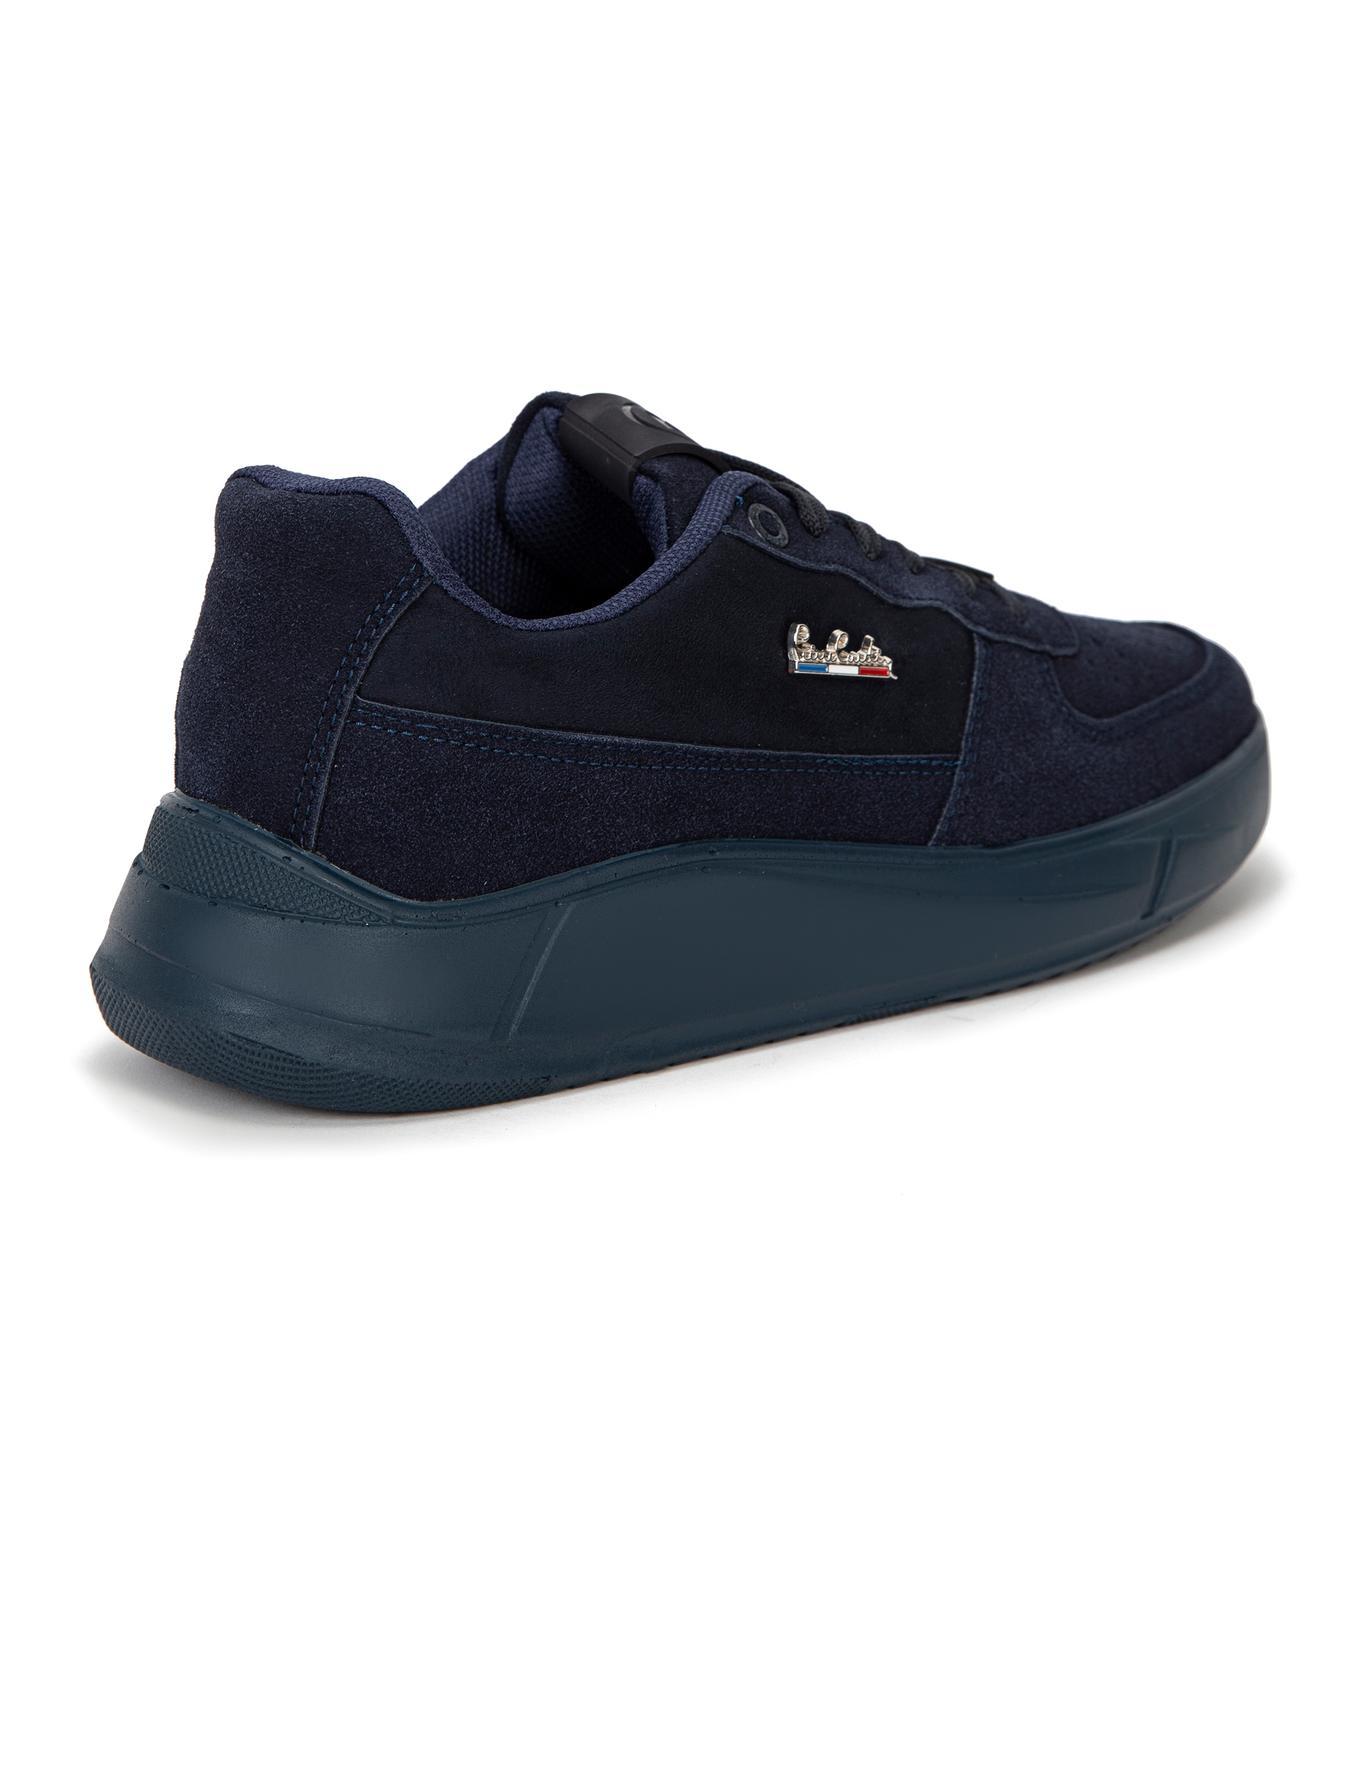 Lacivert Sneakers Ayakkabı